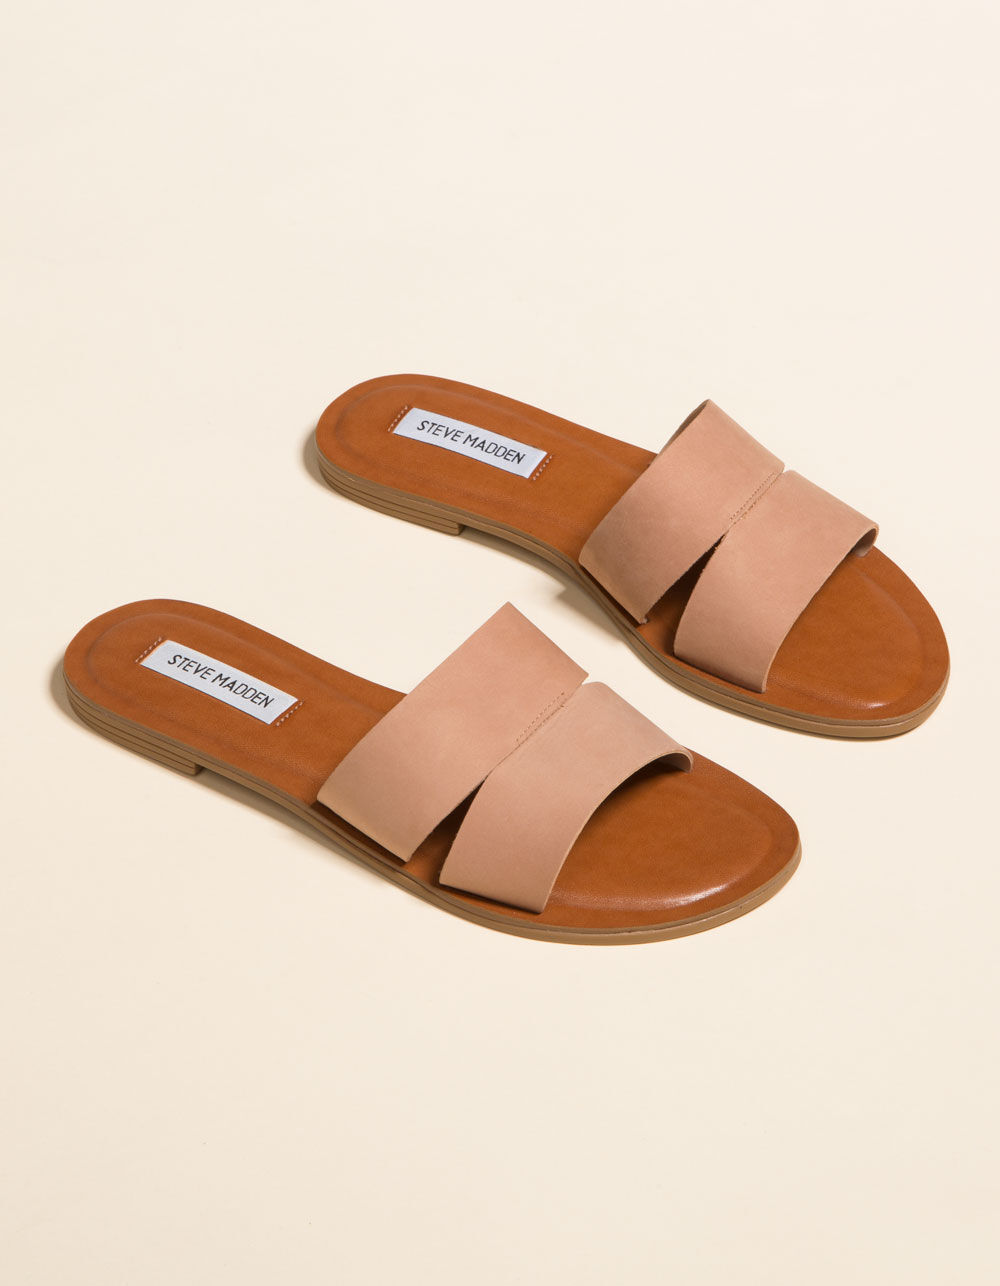 STEVE MADDEN Alexandra Camel Nubuck Sandals